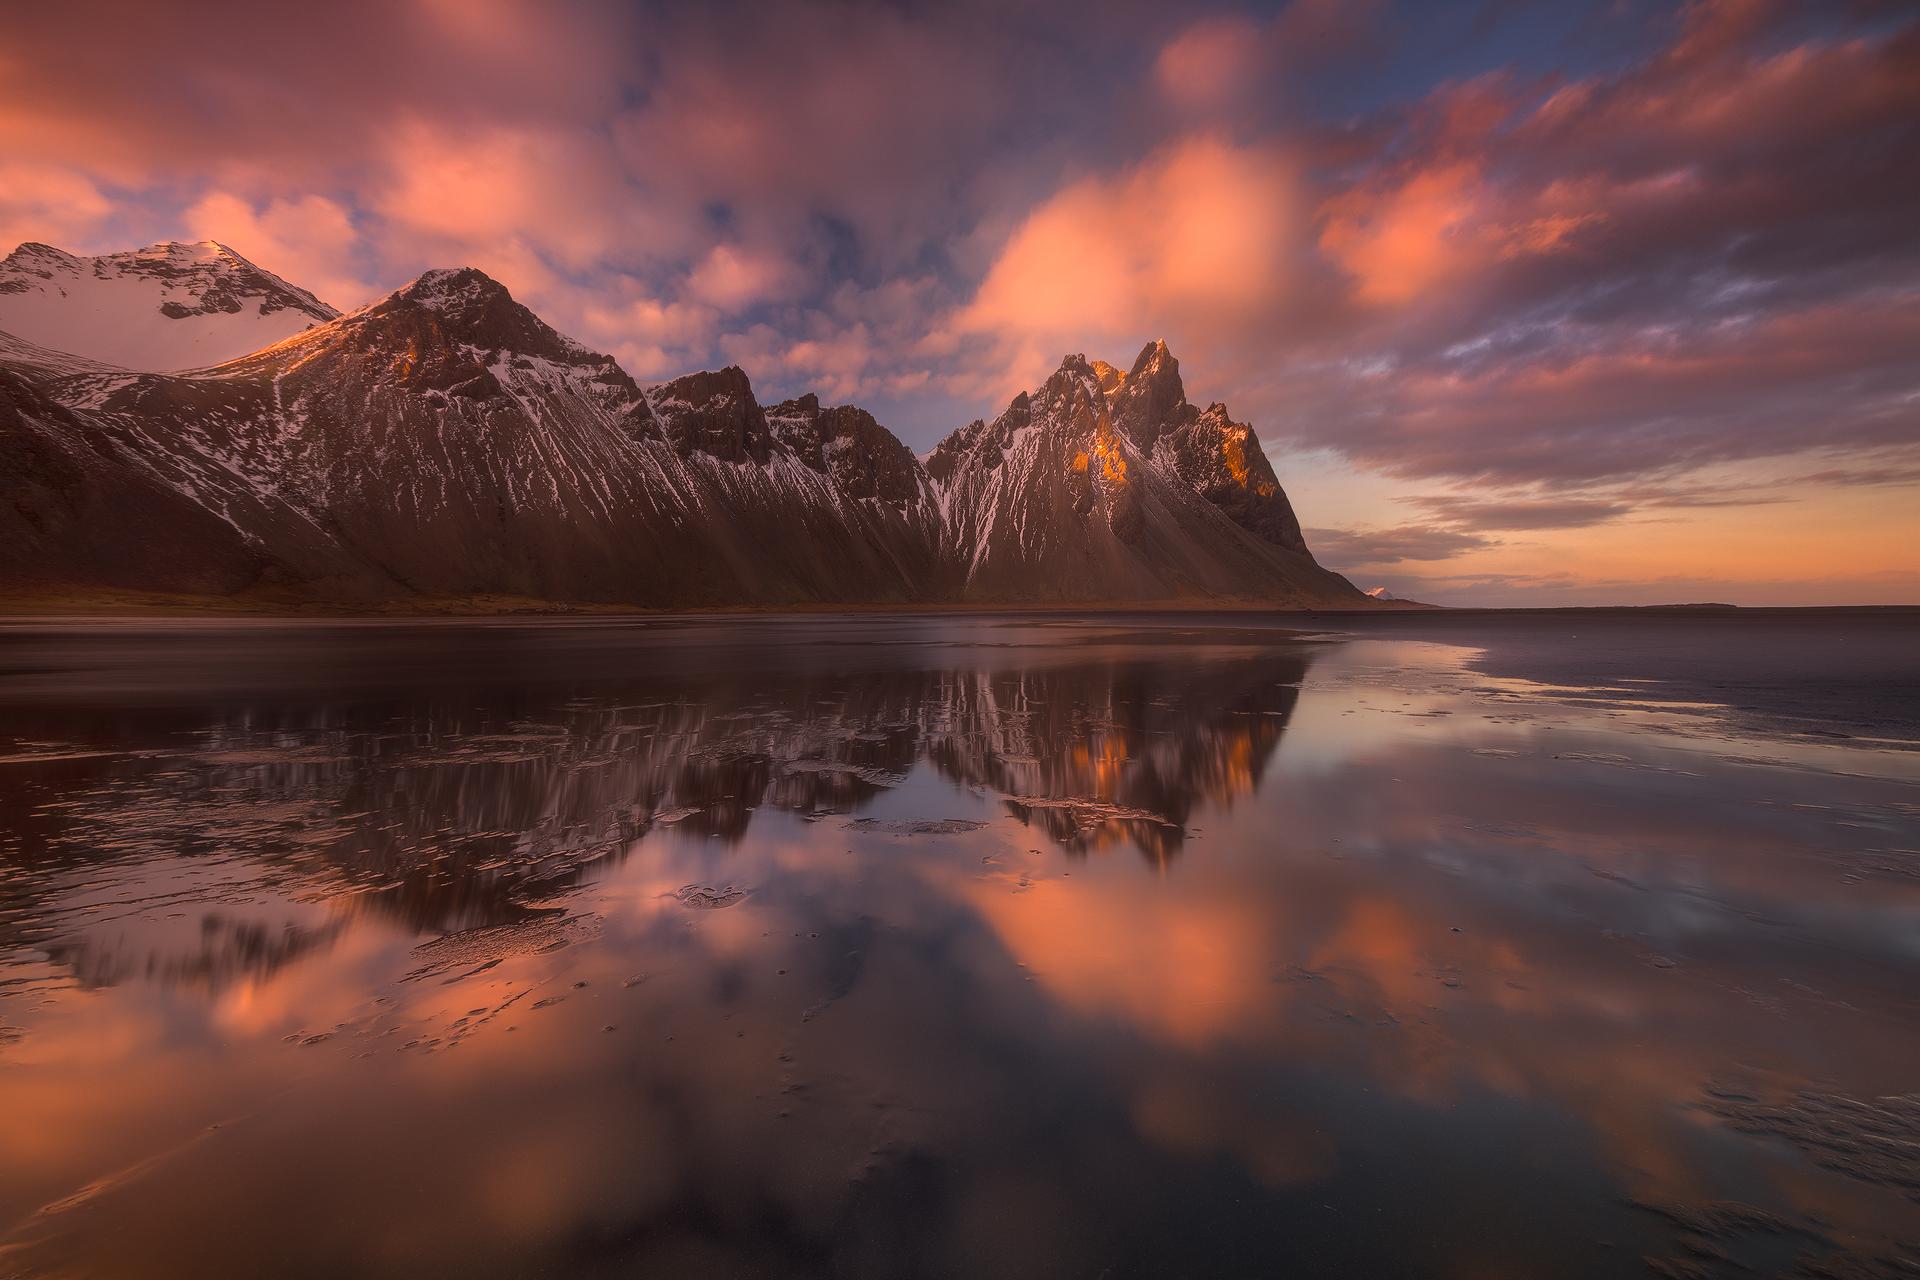 Jökulsárlón glacier lagoon is a great place for long exposure photography.